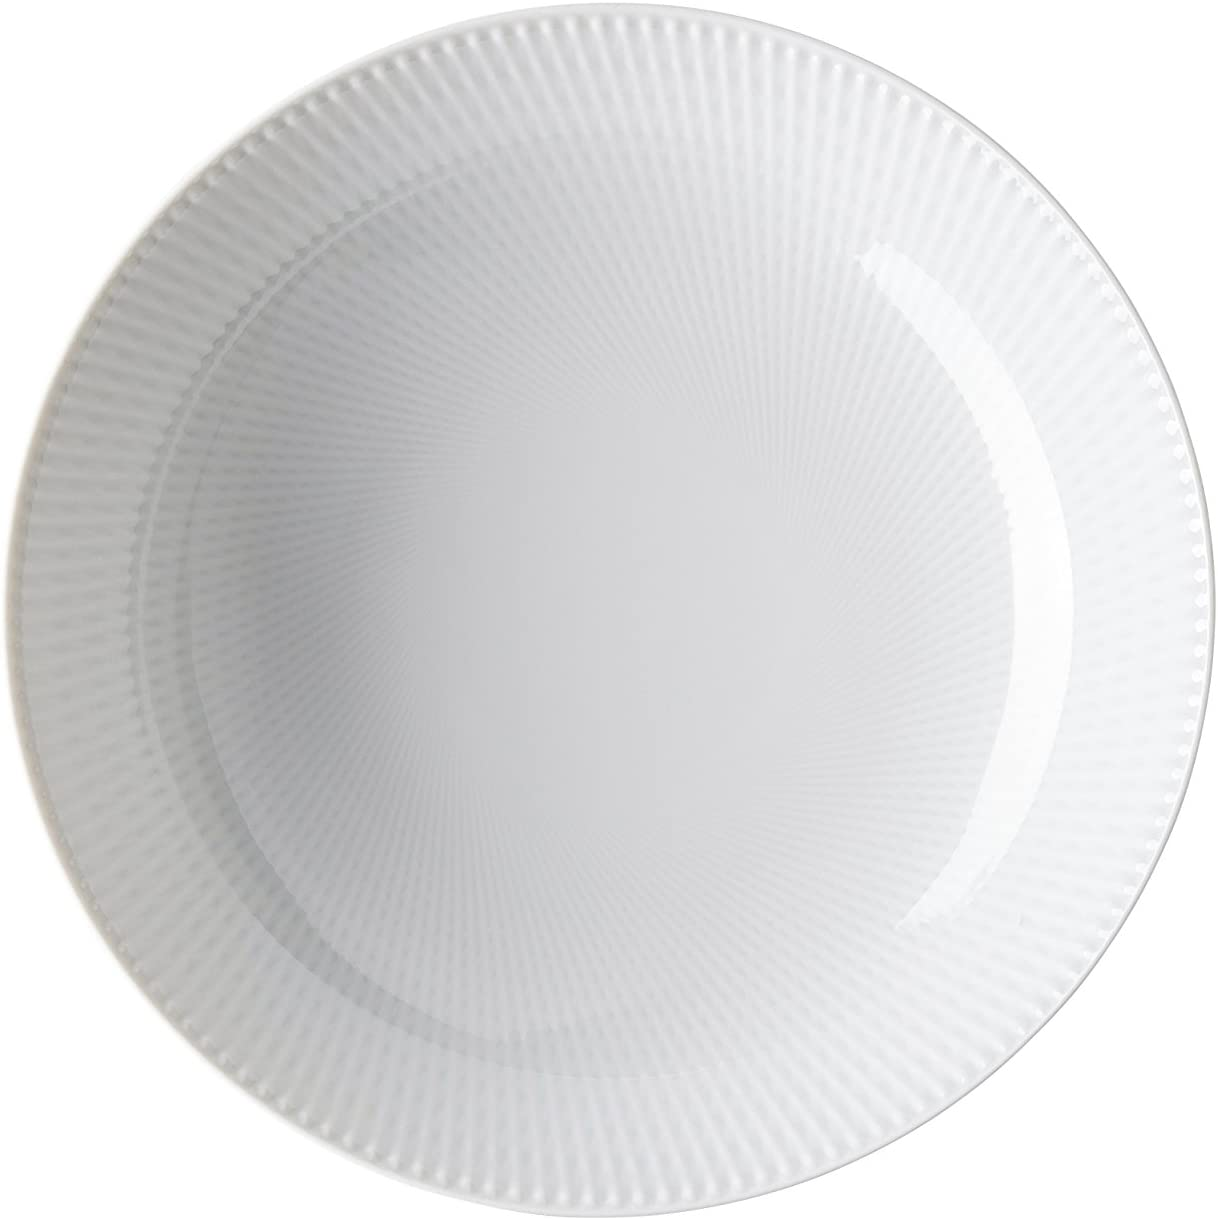 Blend Blanco Plato hondo (22 cm, relieve 3: cruzado: Amazon.es: Hogar